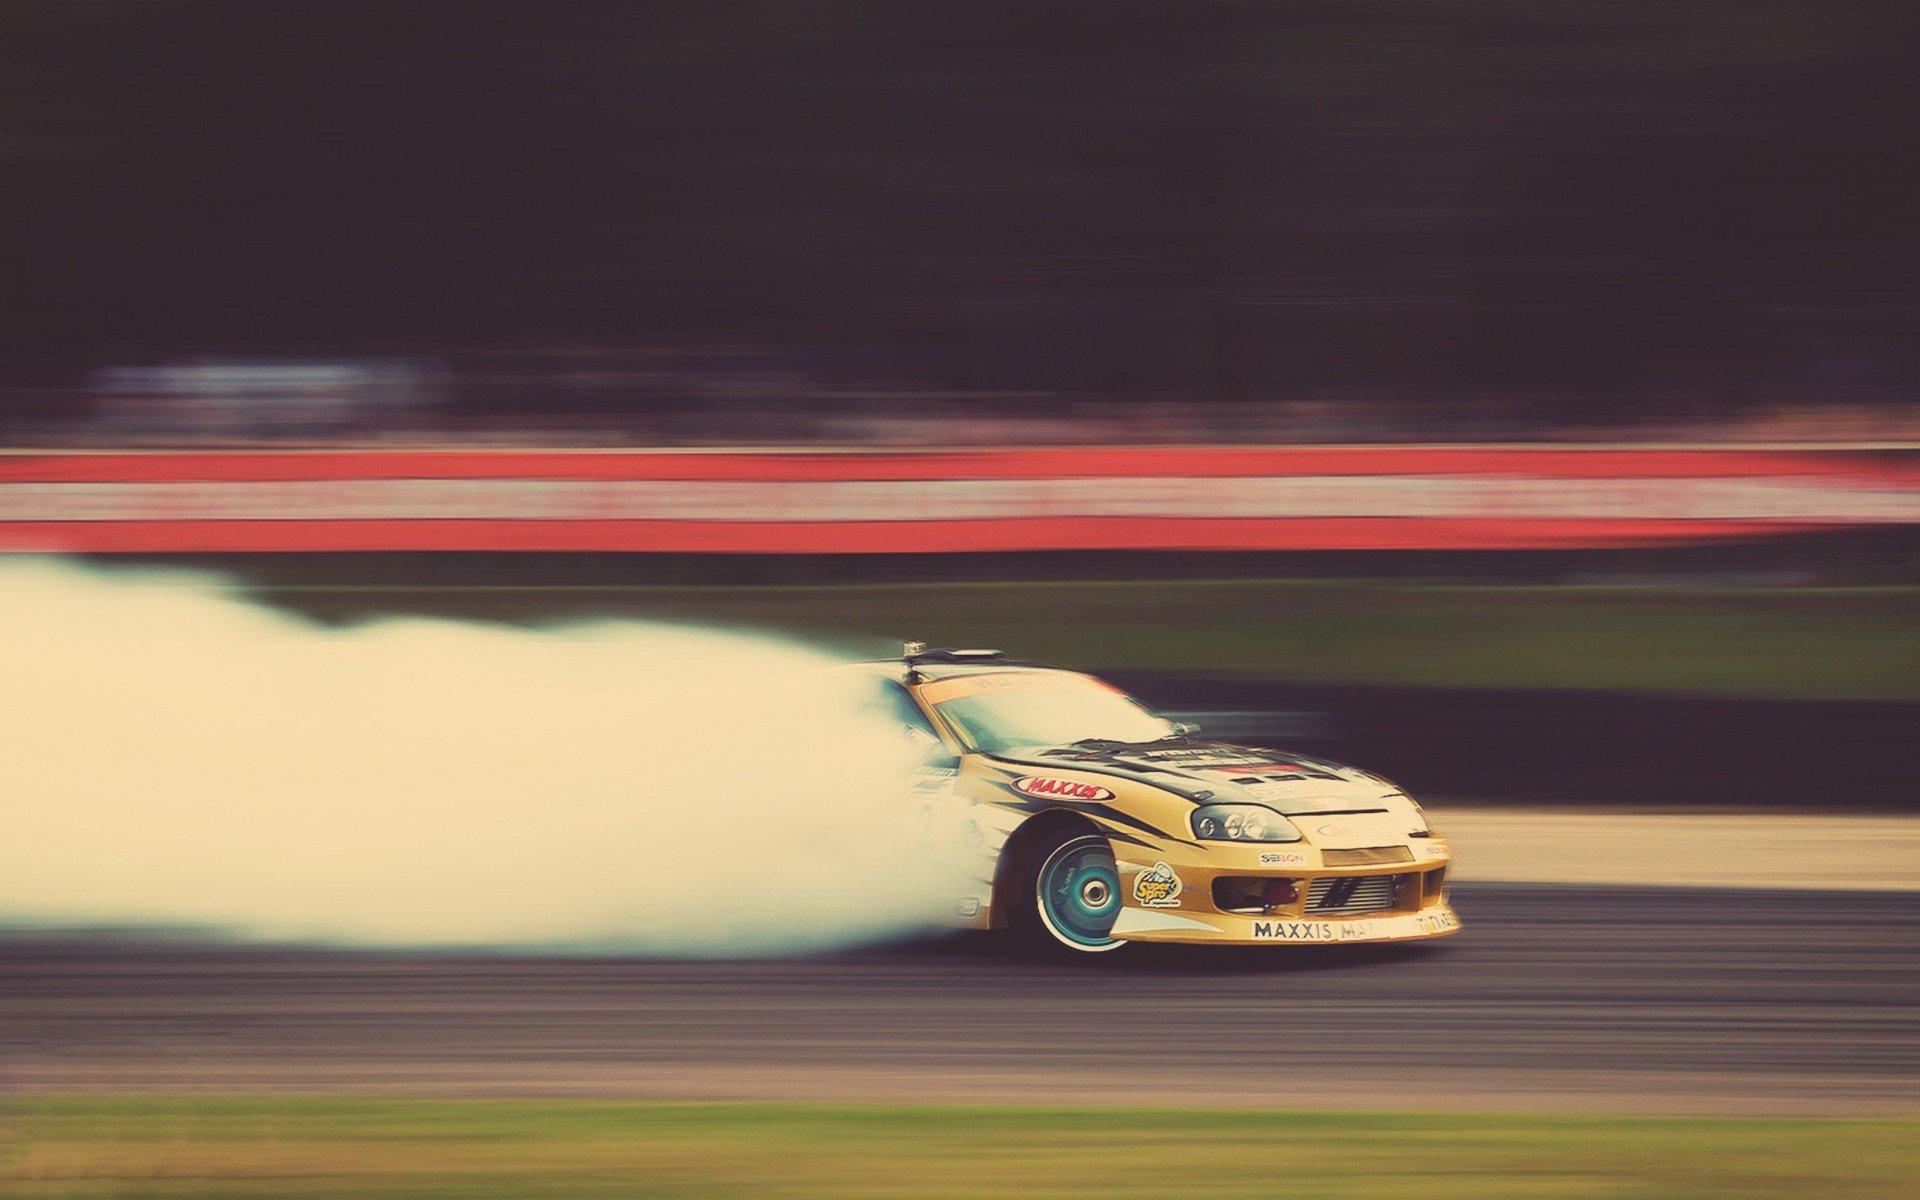 Cars smoke tuning Toyota Supra drifting wallpaper 1920x1200 234020 1920x1200